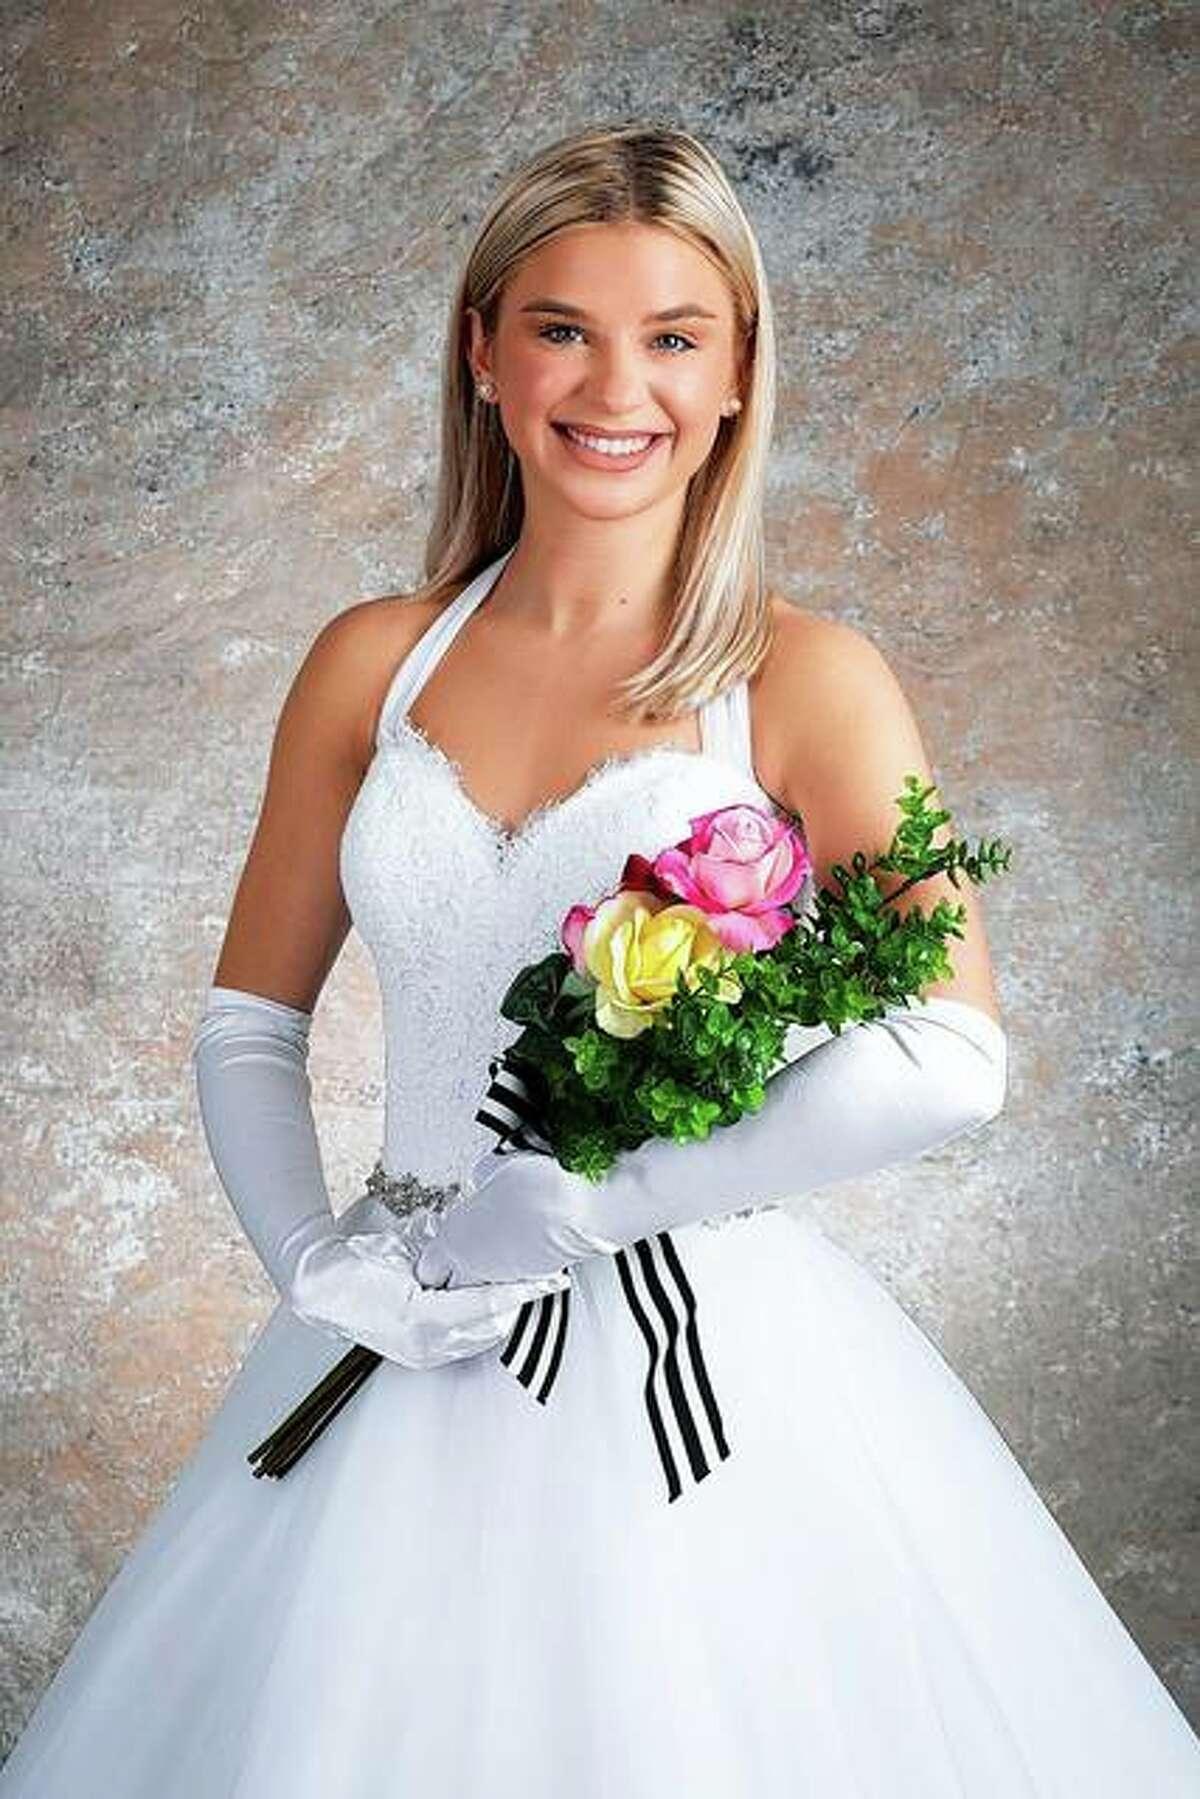 Claire Madison Van Aken